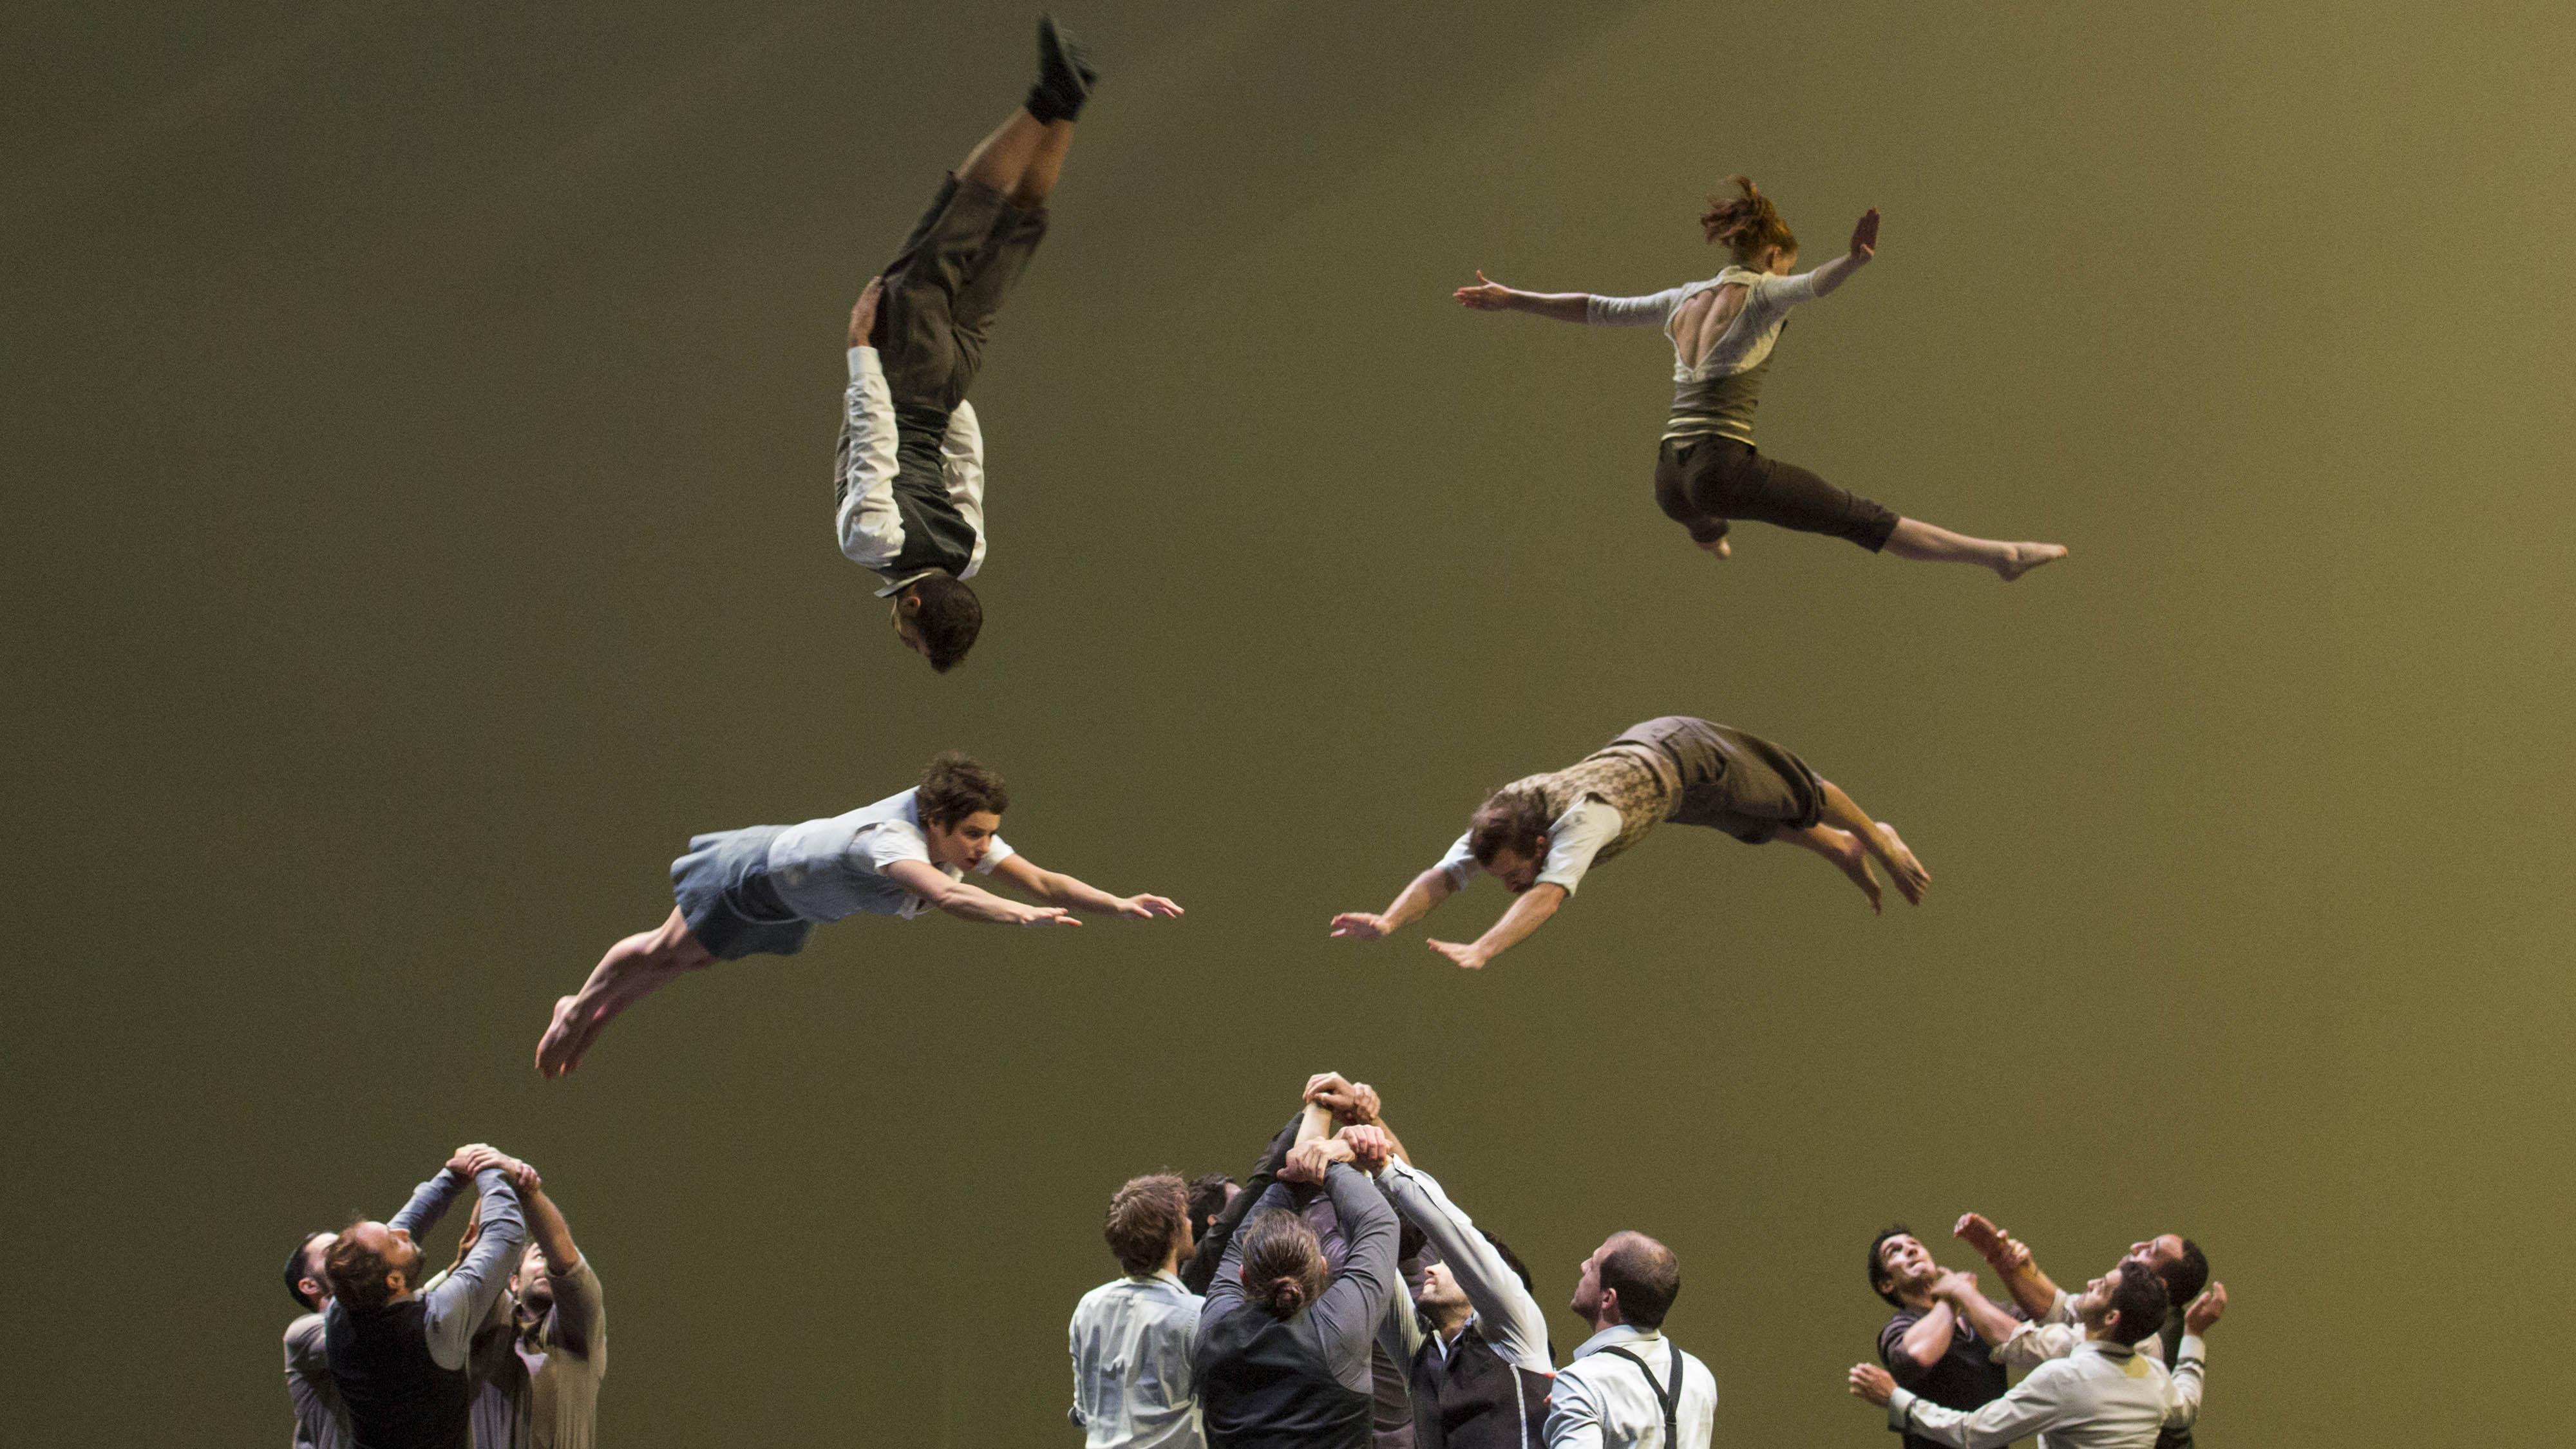 The Physics of Acrobatics